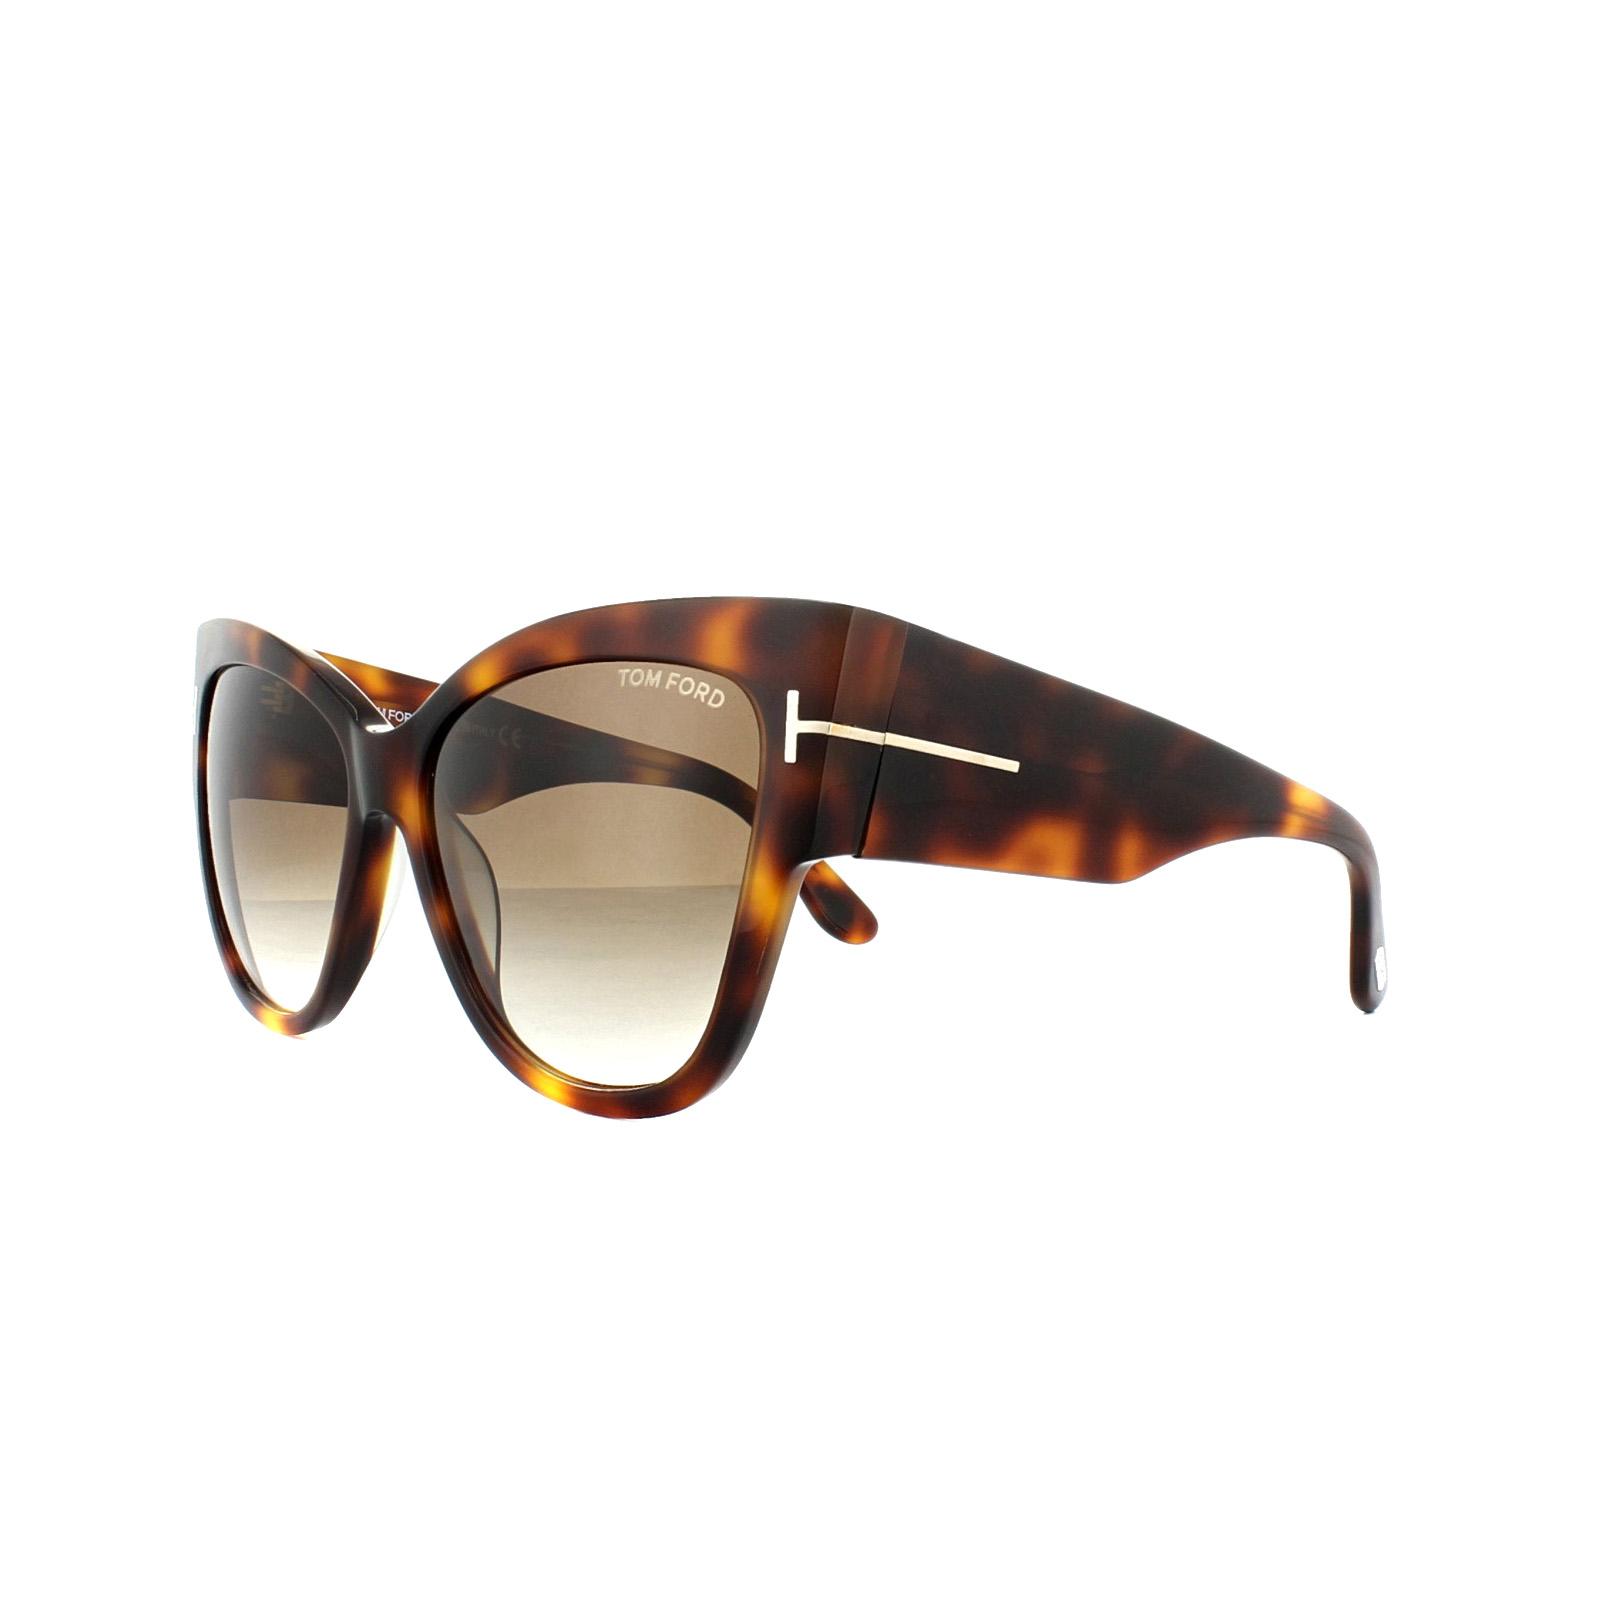 3f0ebe90ffd9 Cheap Tom Ford 0371 Anoushka Sunglasses - Discounted Sunglasses